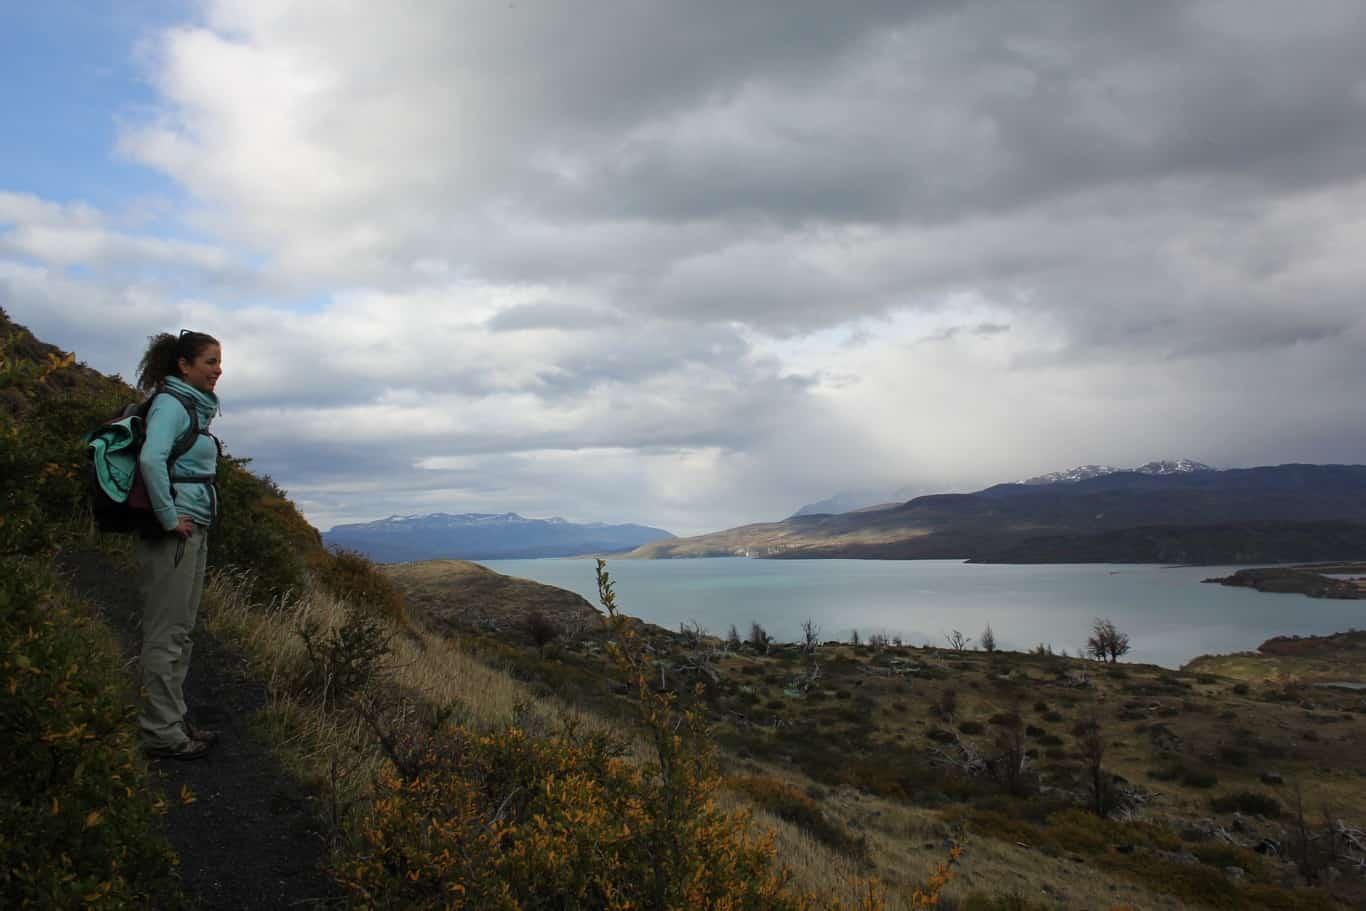 Torres Del Paine National Park Lazo Weber Trail Hike